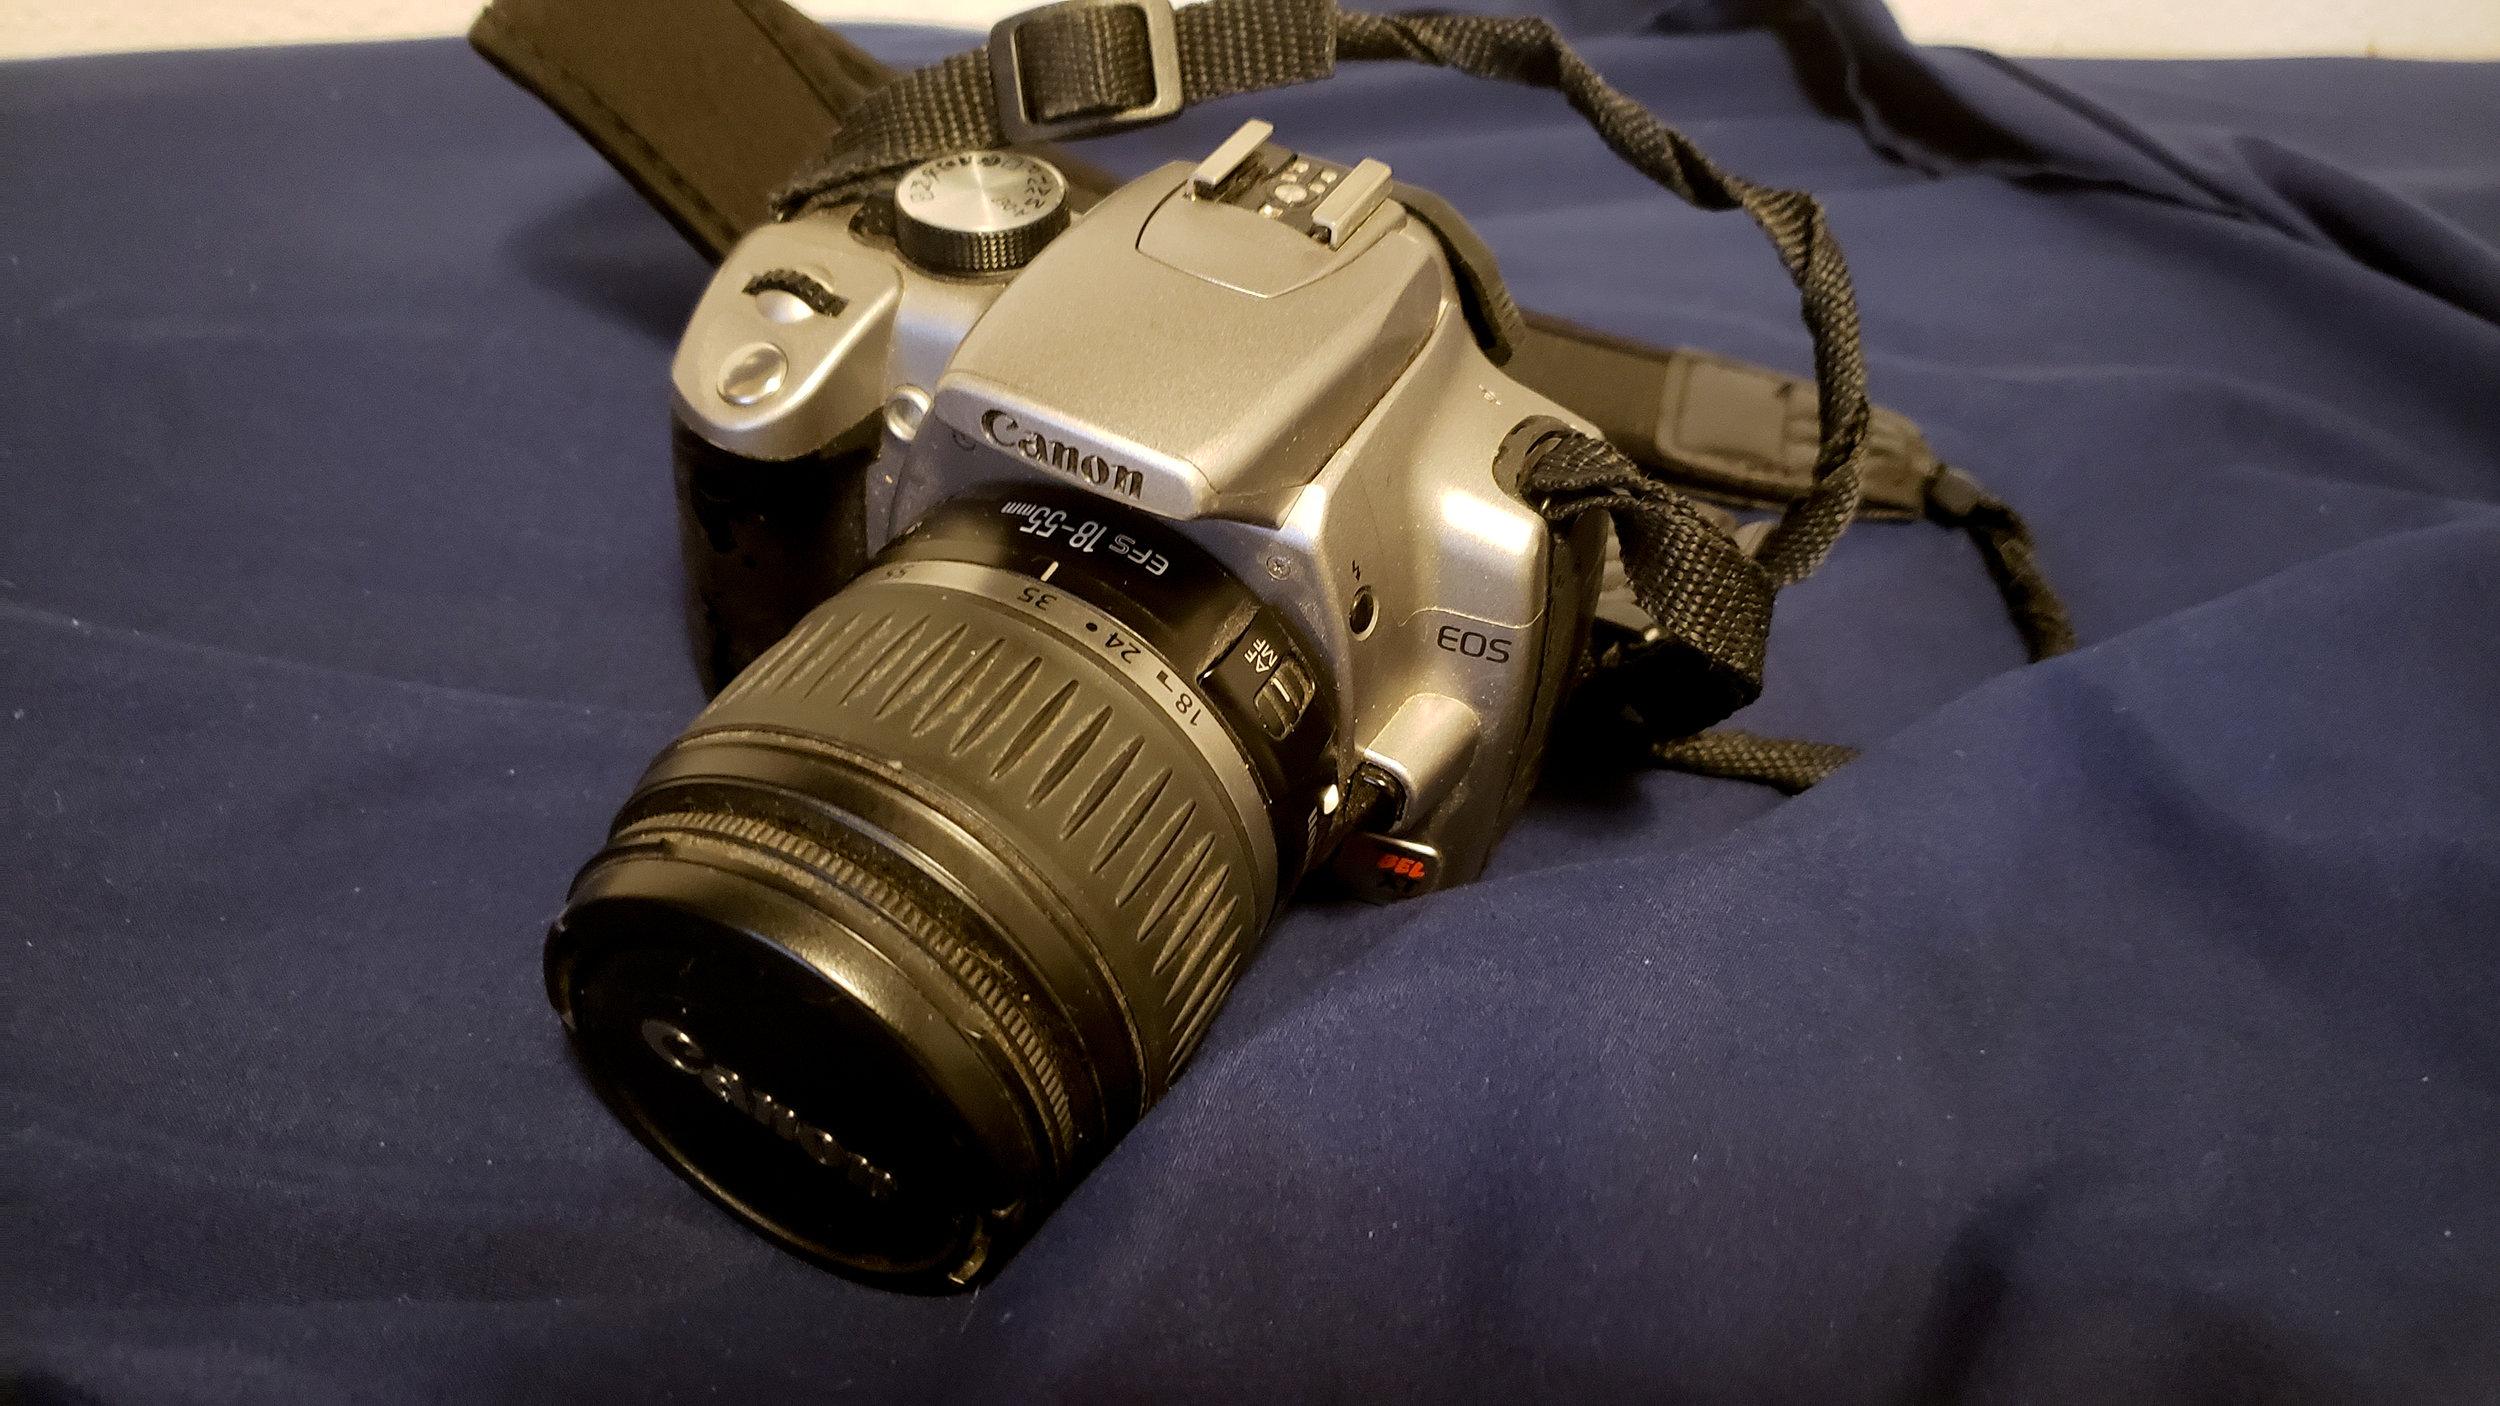 My Canon Rebel XT